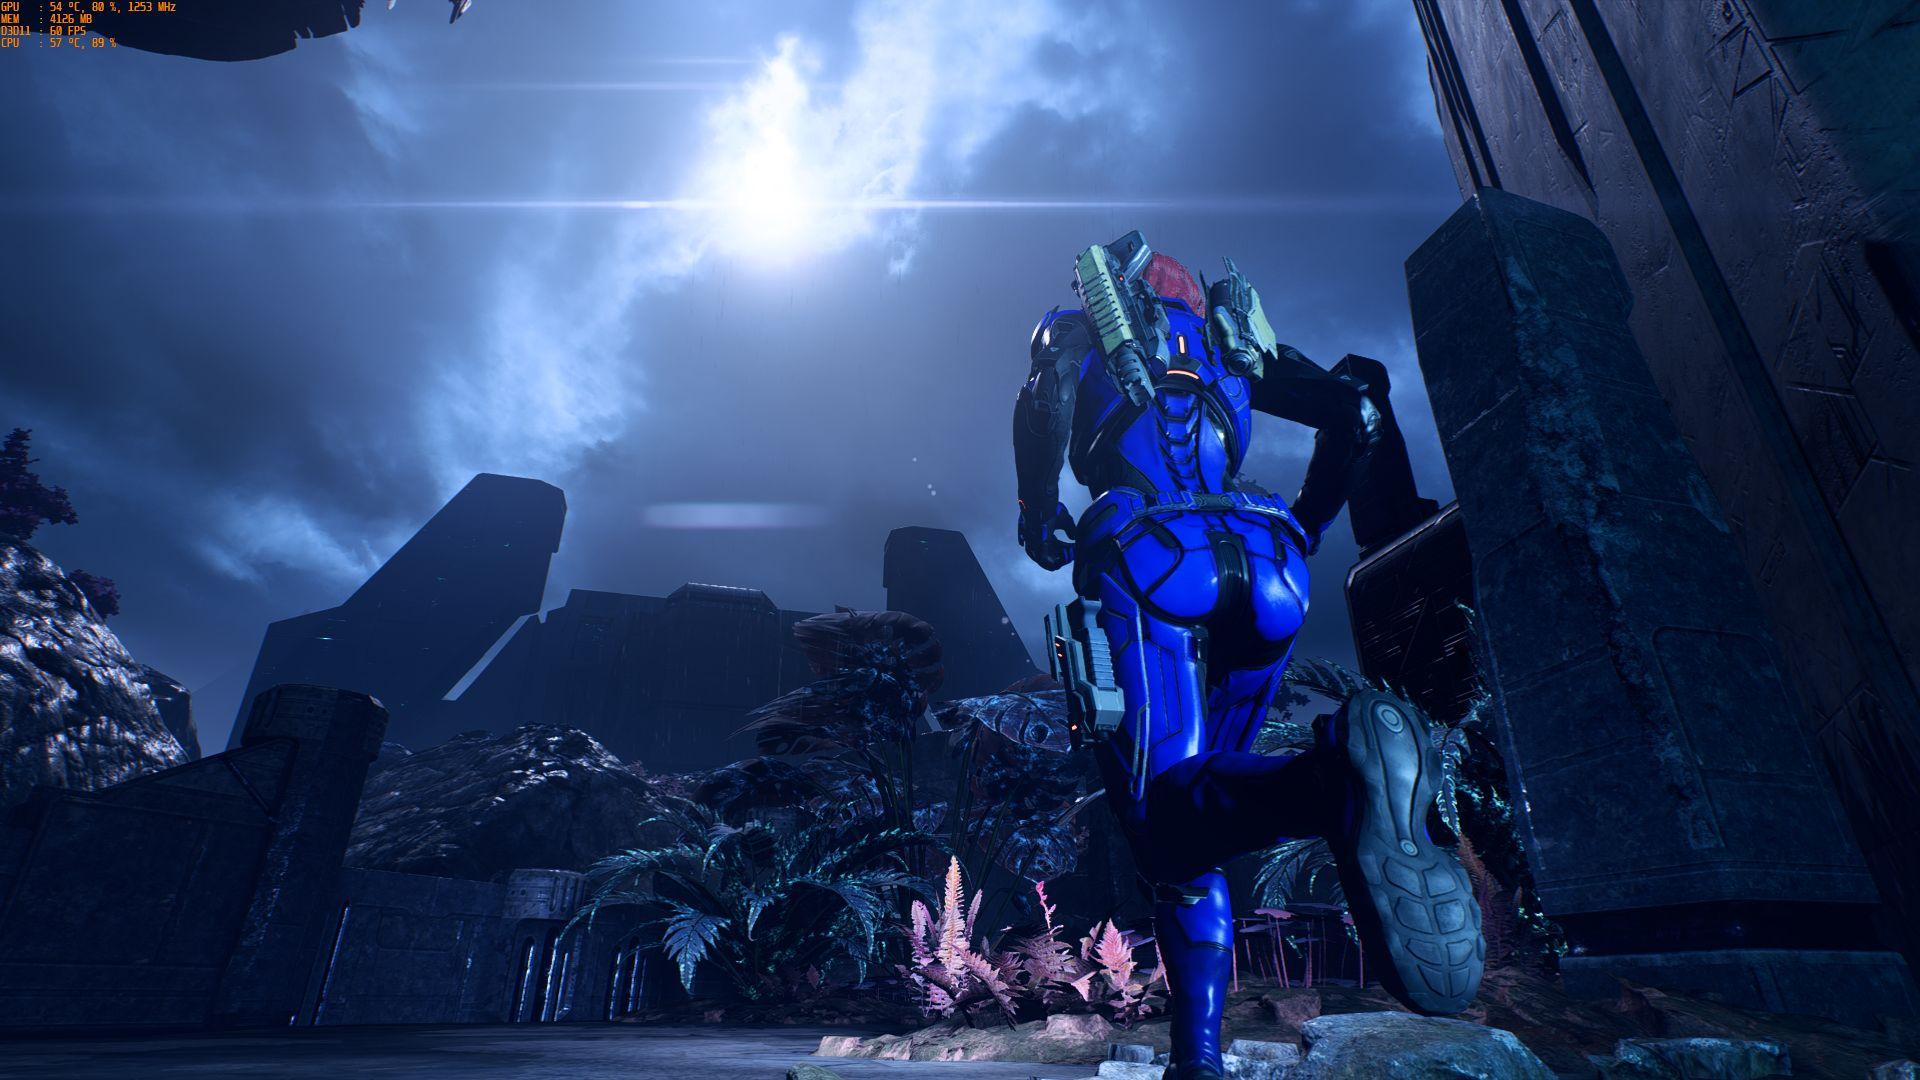 Mass Effect Andromeda Screenshot 2017.07.23 - 16.29.03.93.jpg - Mass Effect: Andromeda